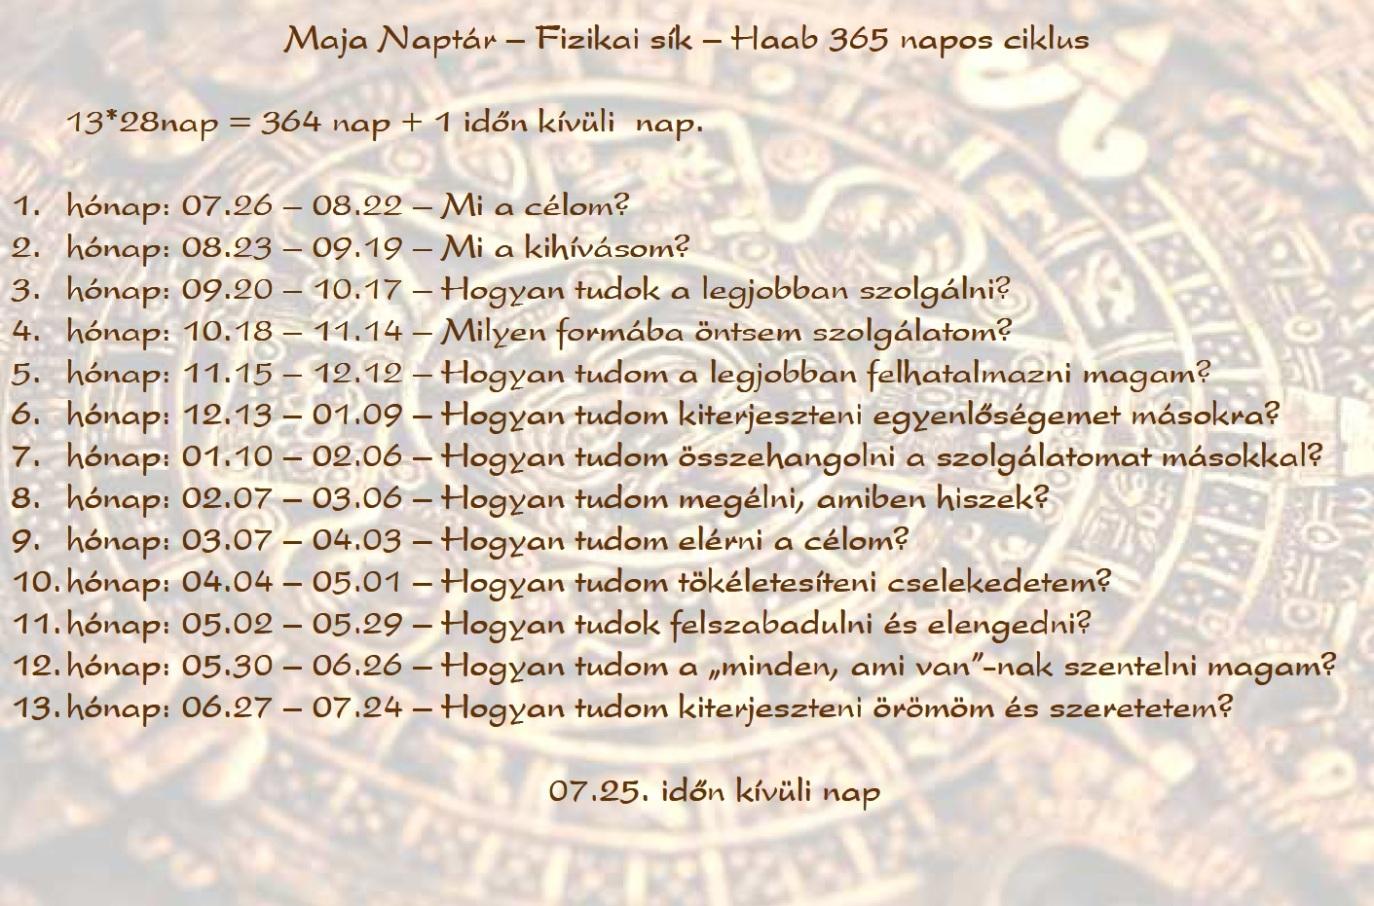 Maja naptár fizikai sík